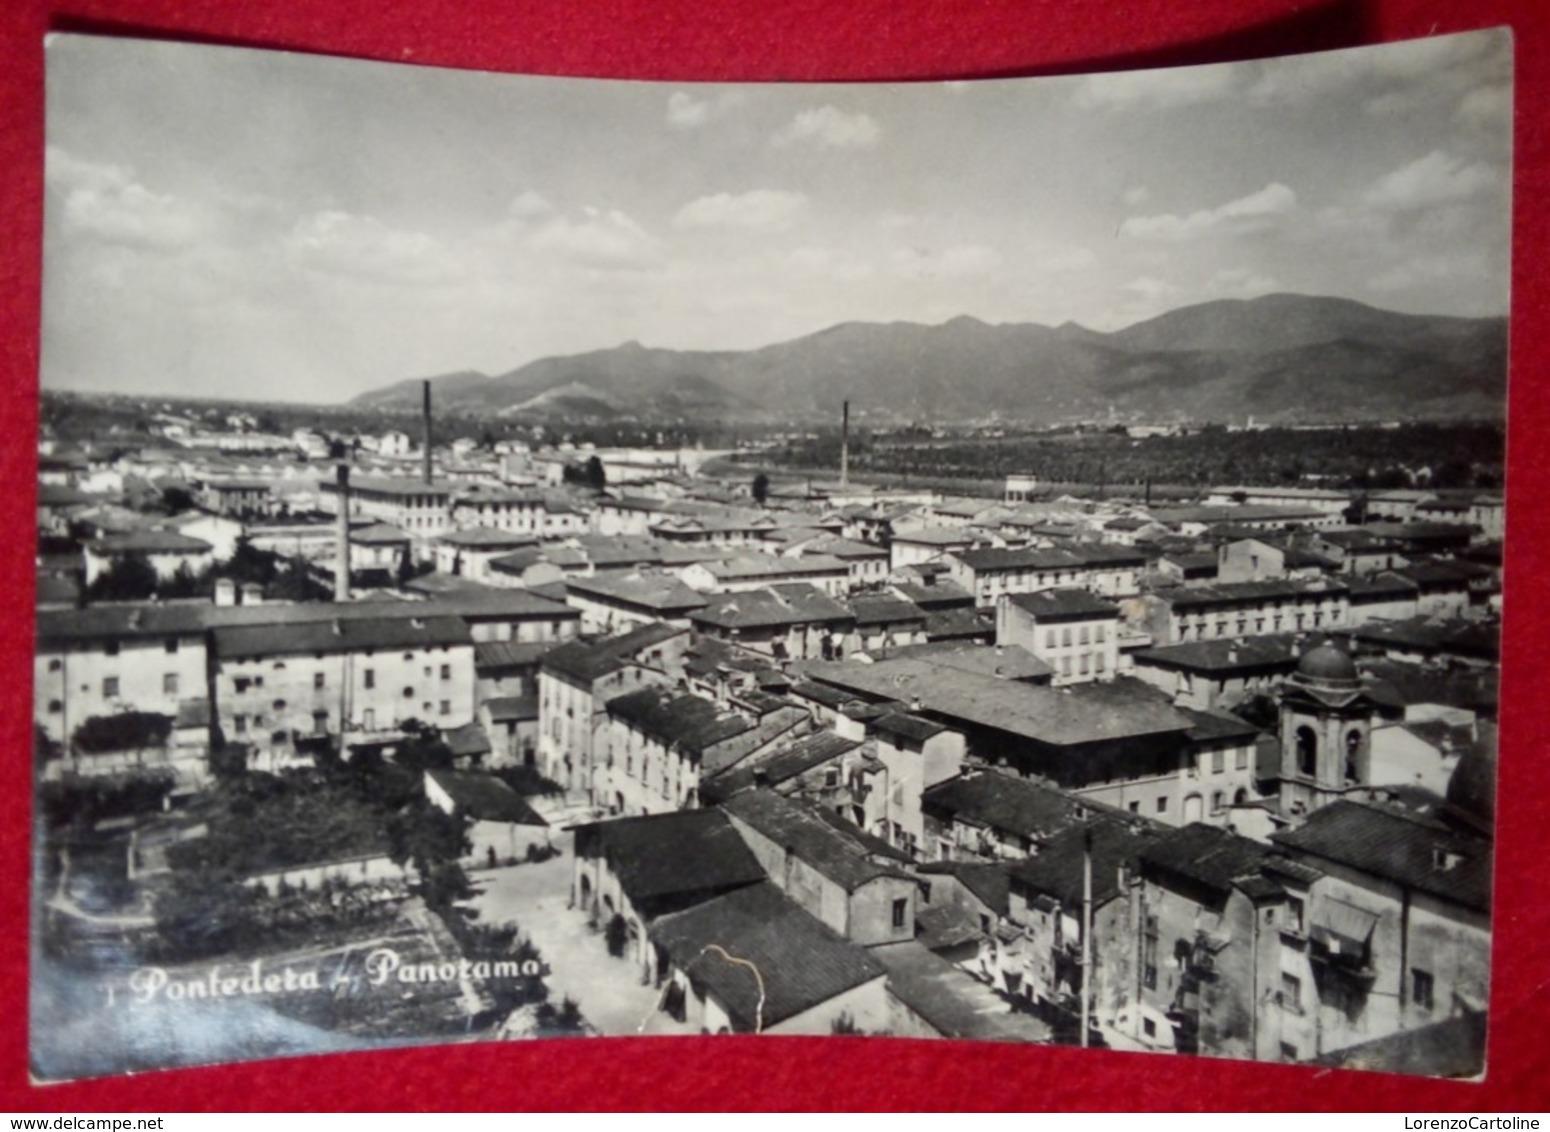 PONTEDERA Pandorama Viaggiata Anni 50 - Italia